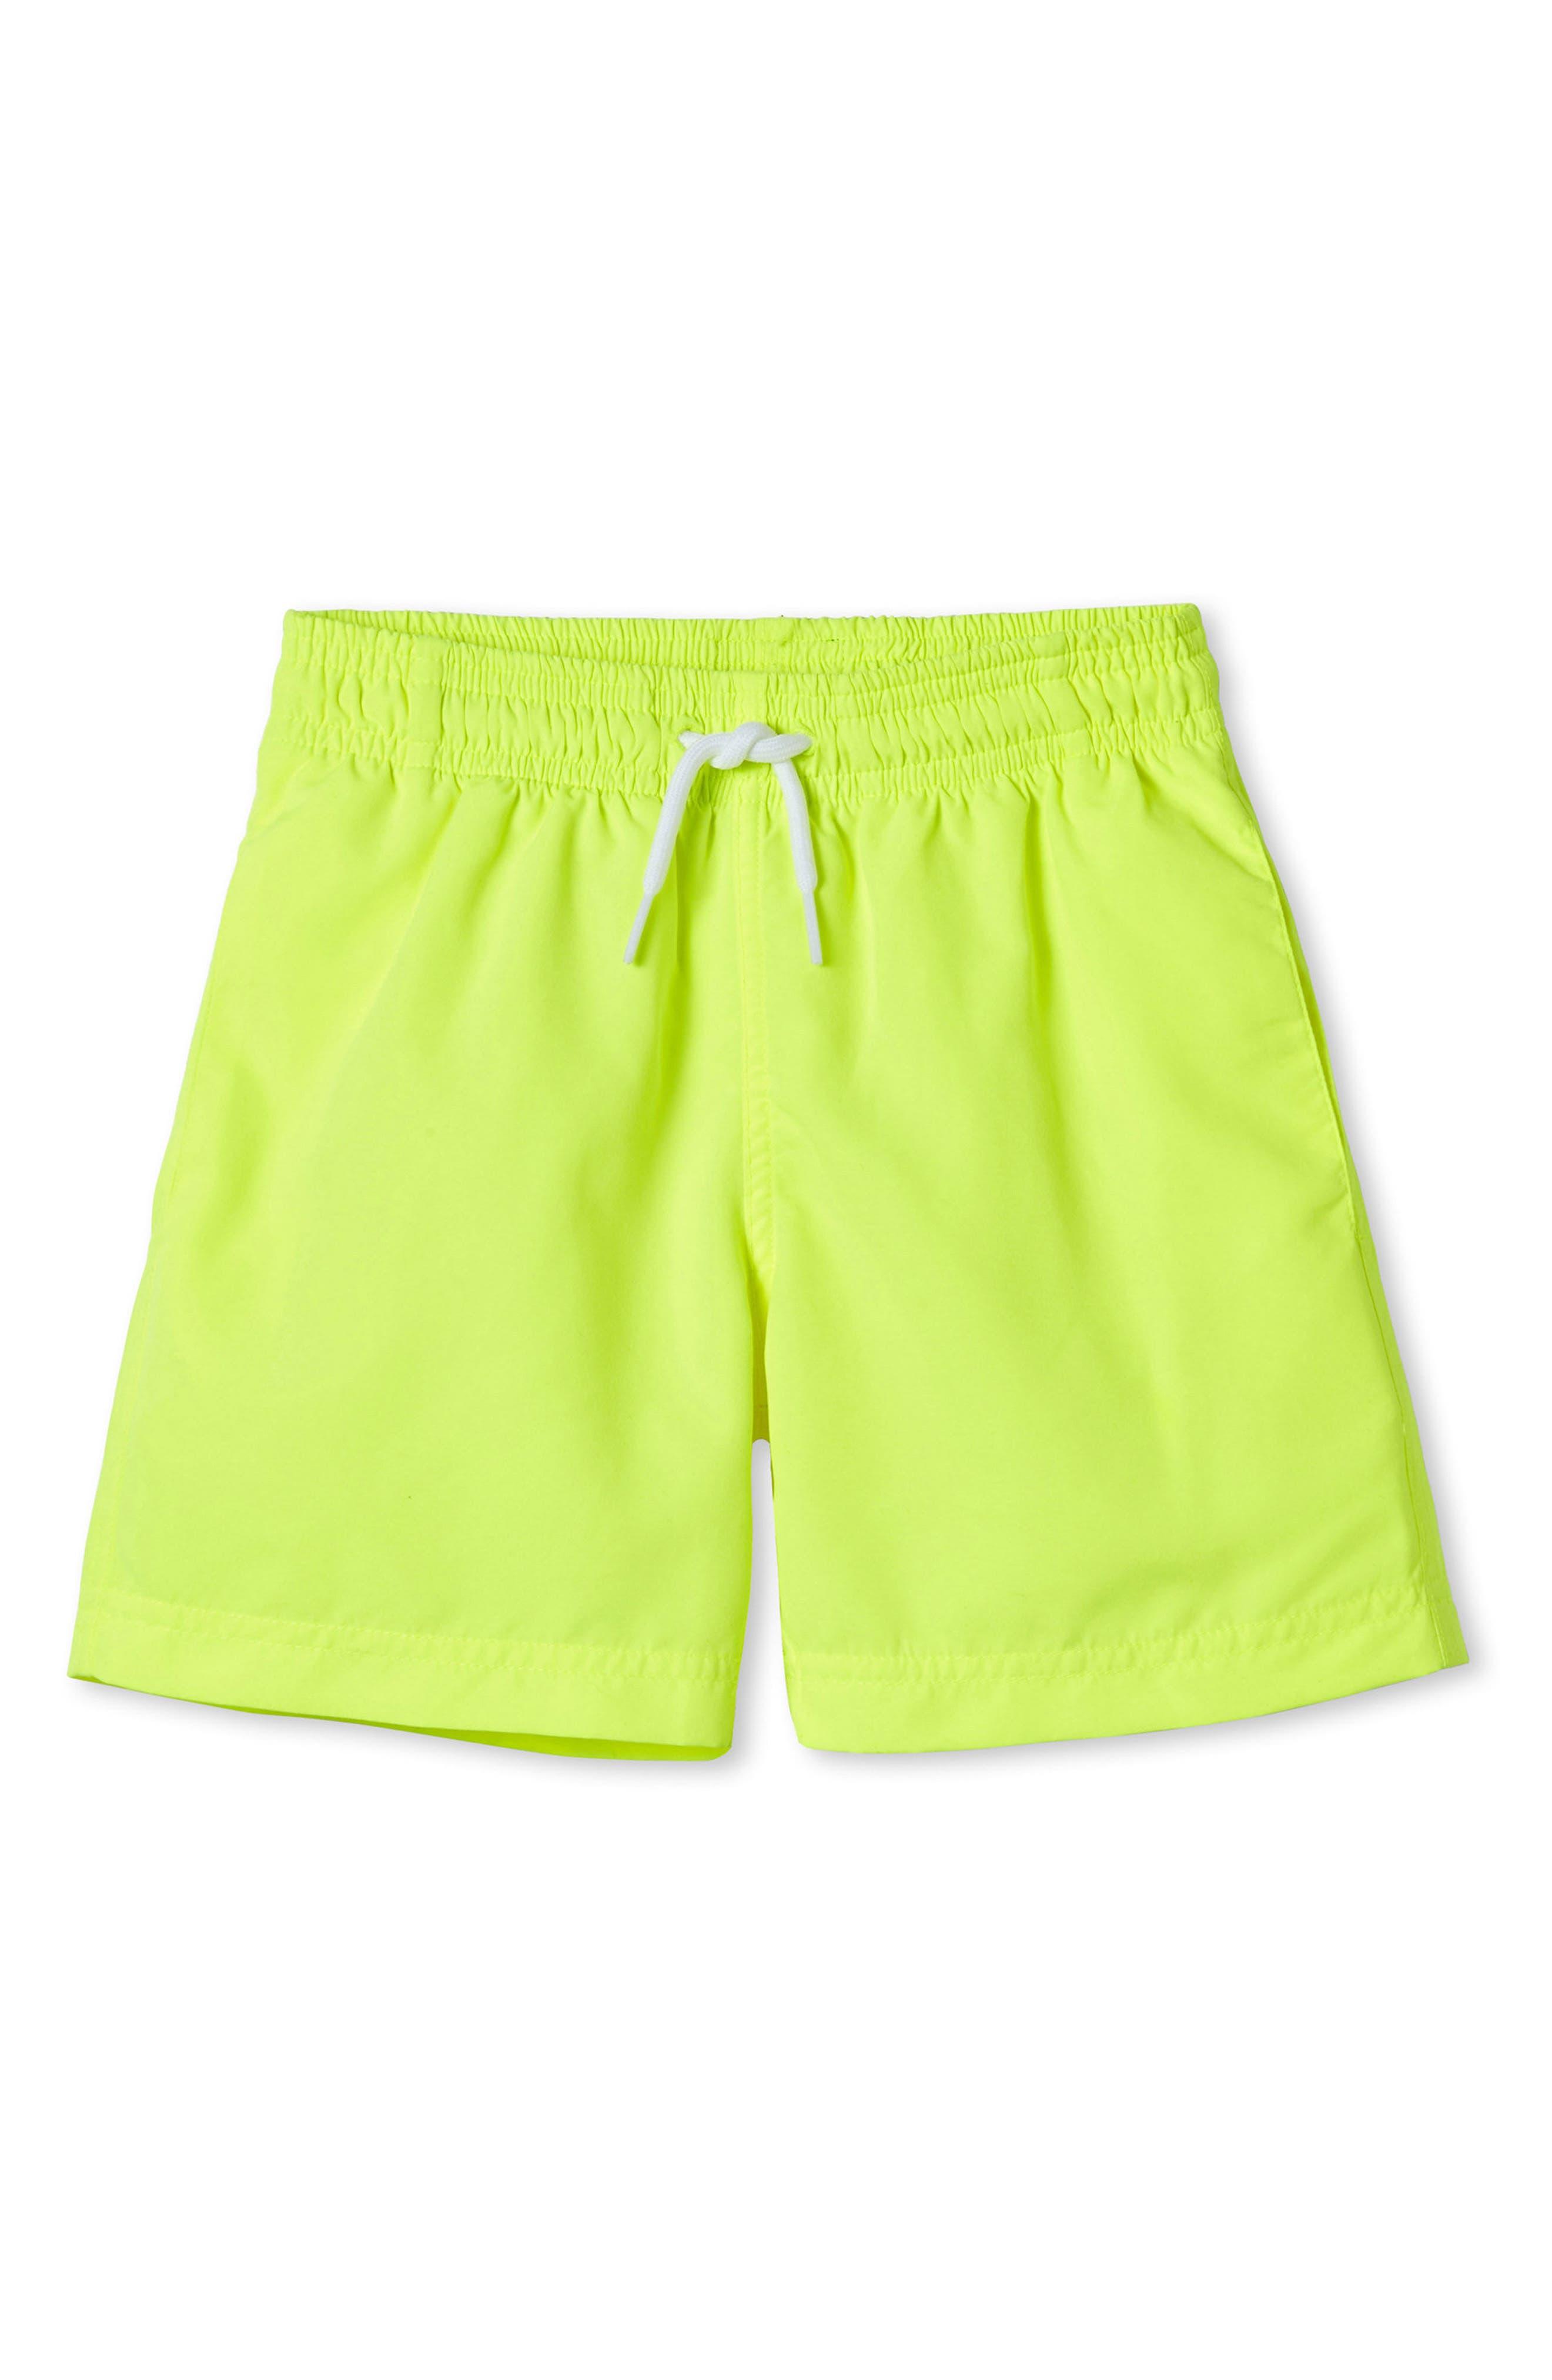 Alternate Image 1 Selected - Stella Cove Neon Yellow Swim Trunks (Toddler Boys & Little Boys)